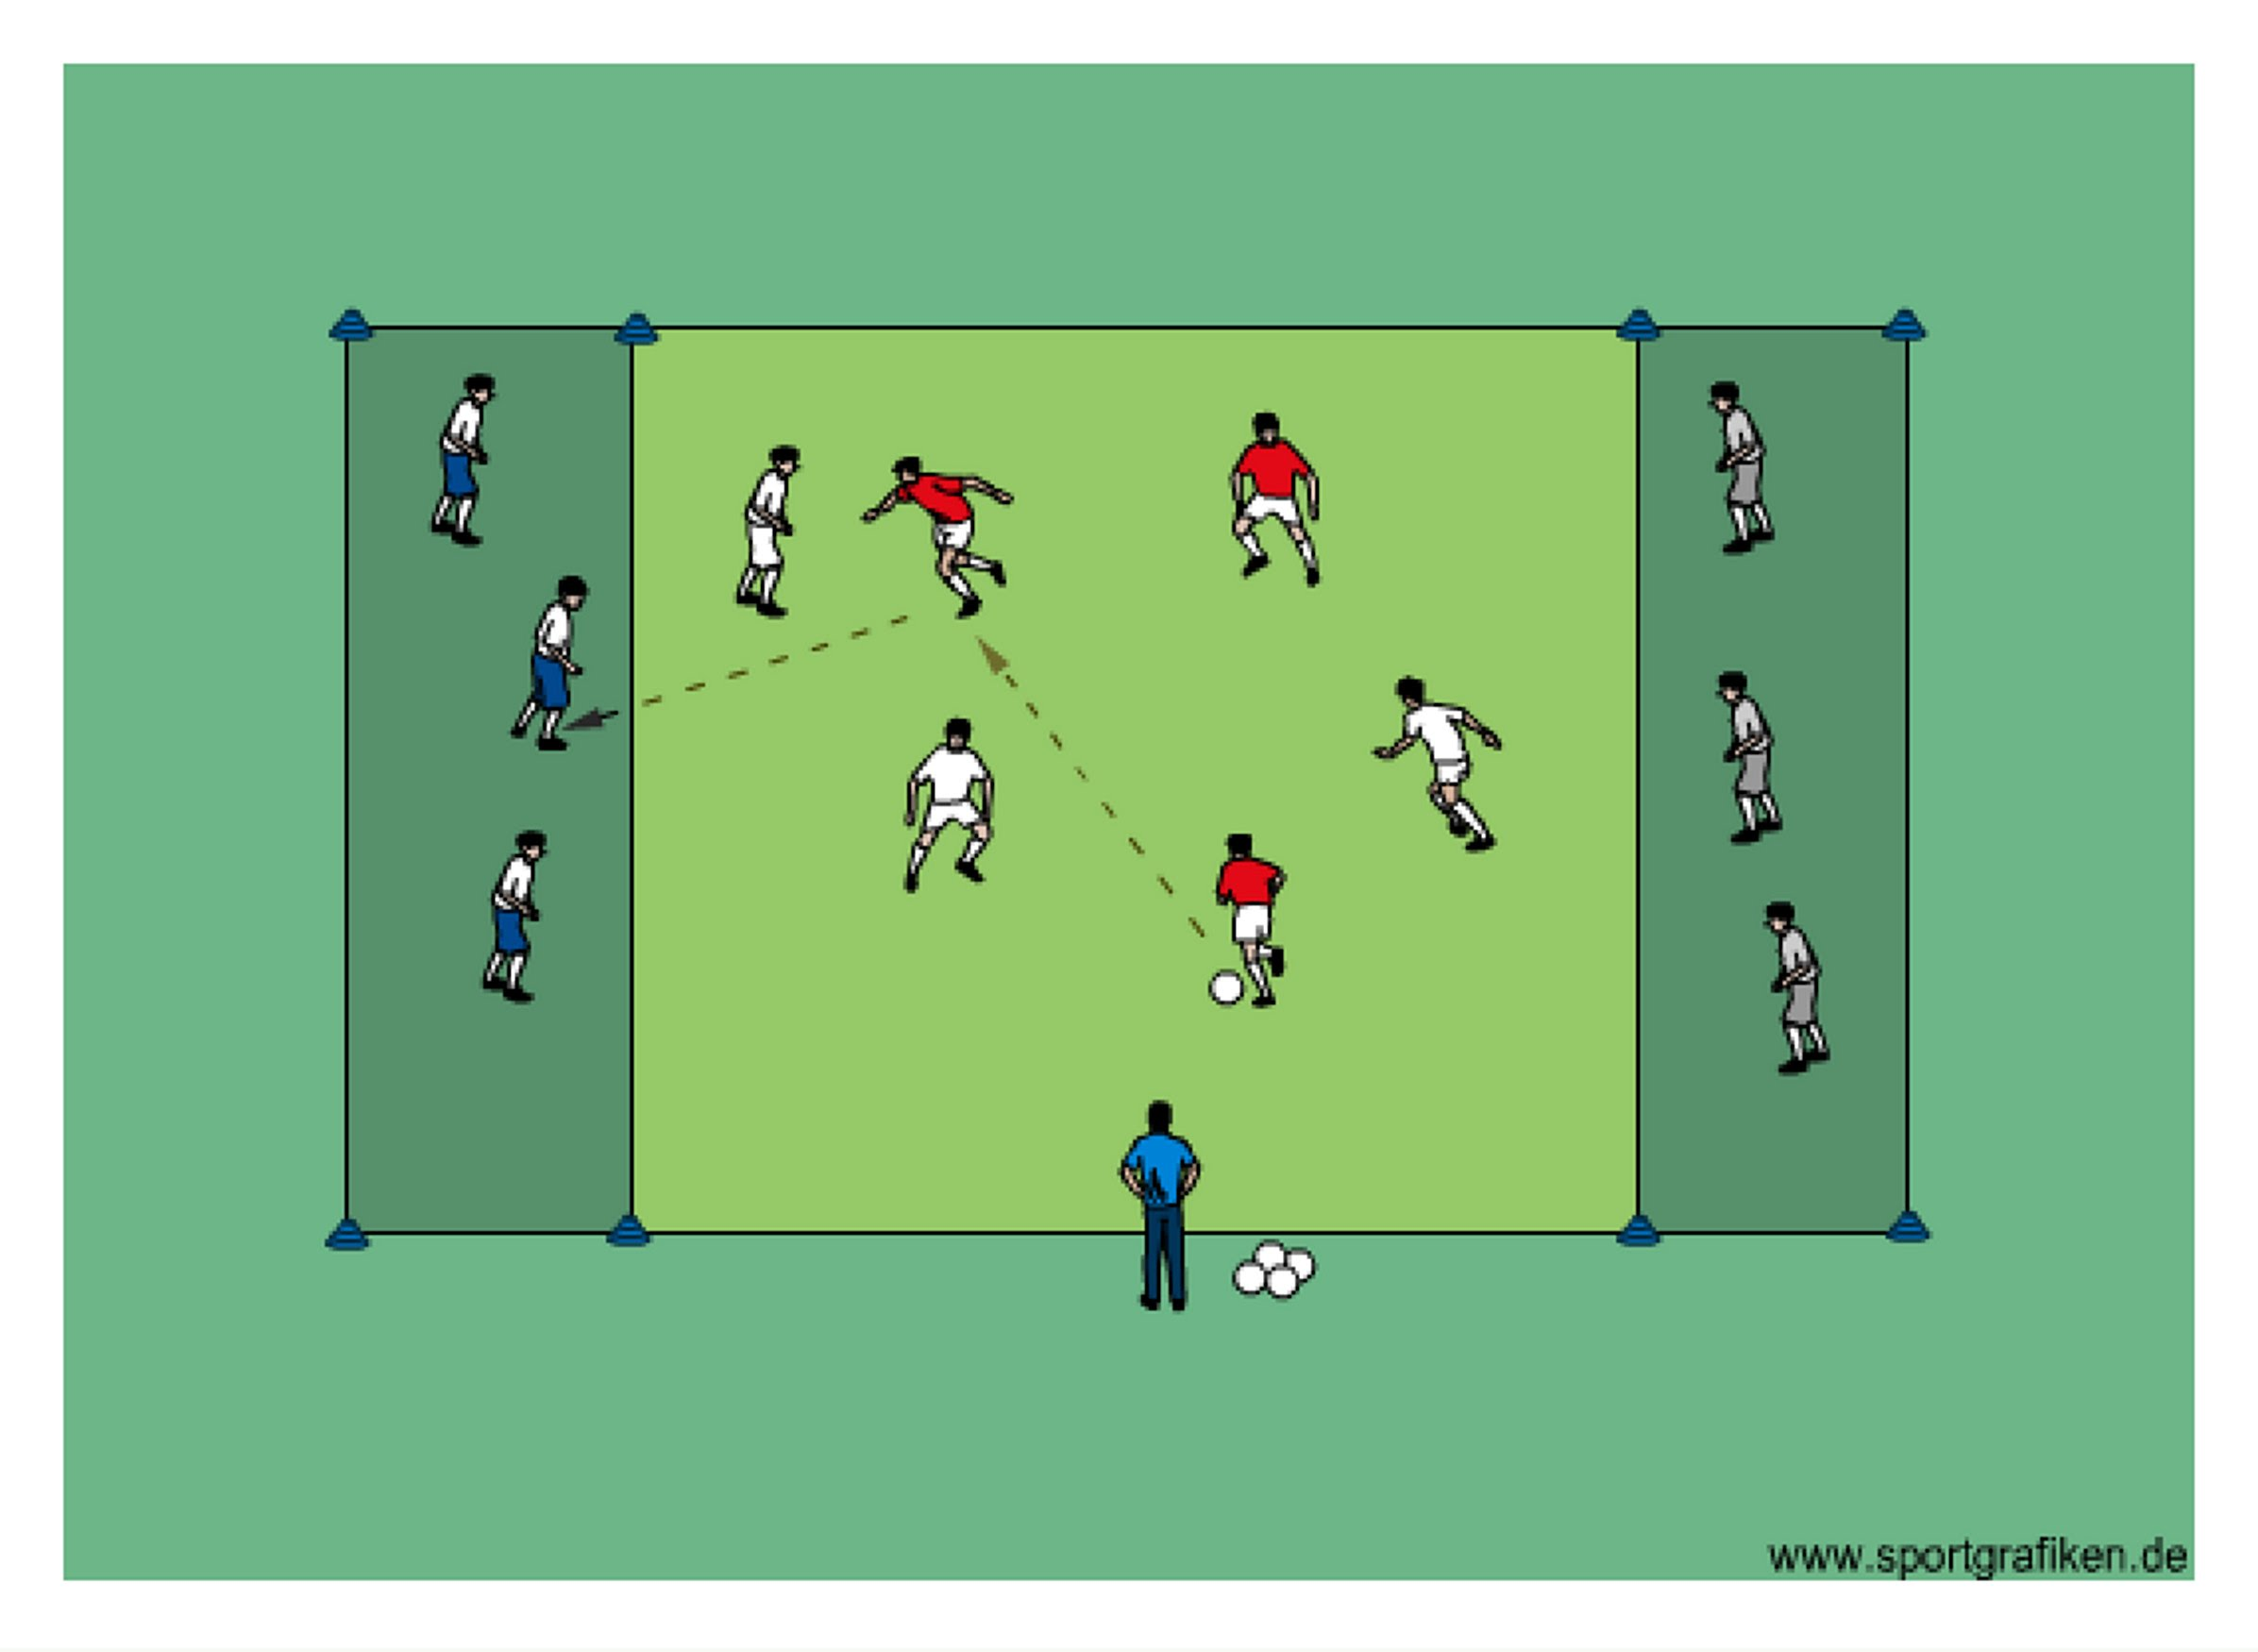 Soccer Defending - Top Soccer Drills for Improving Defense